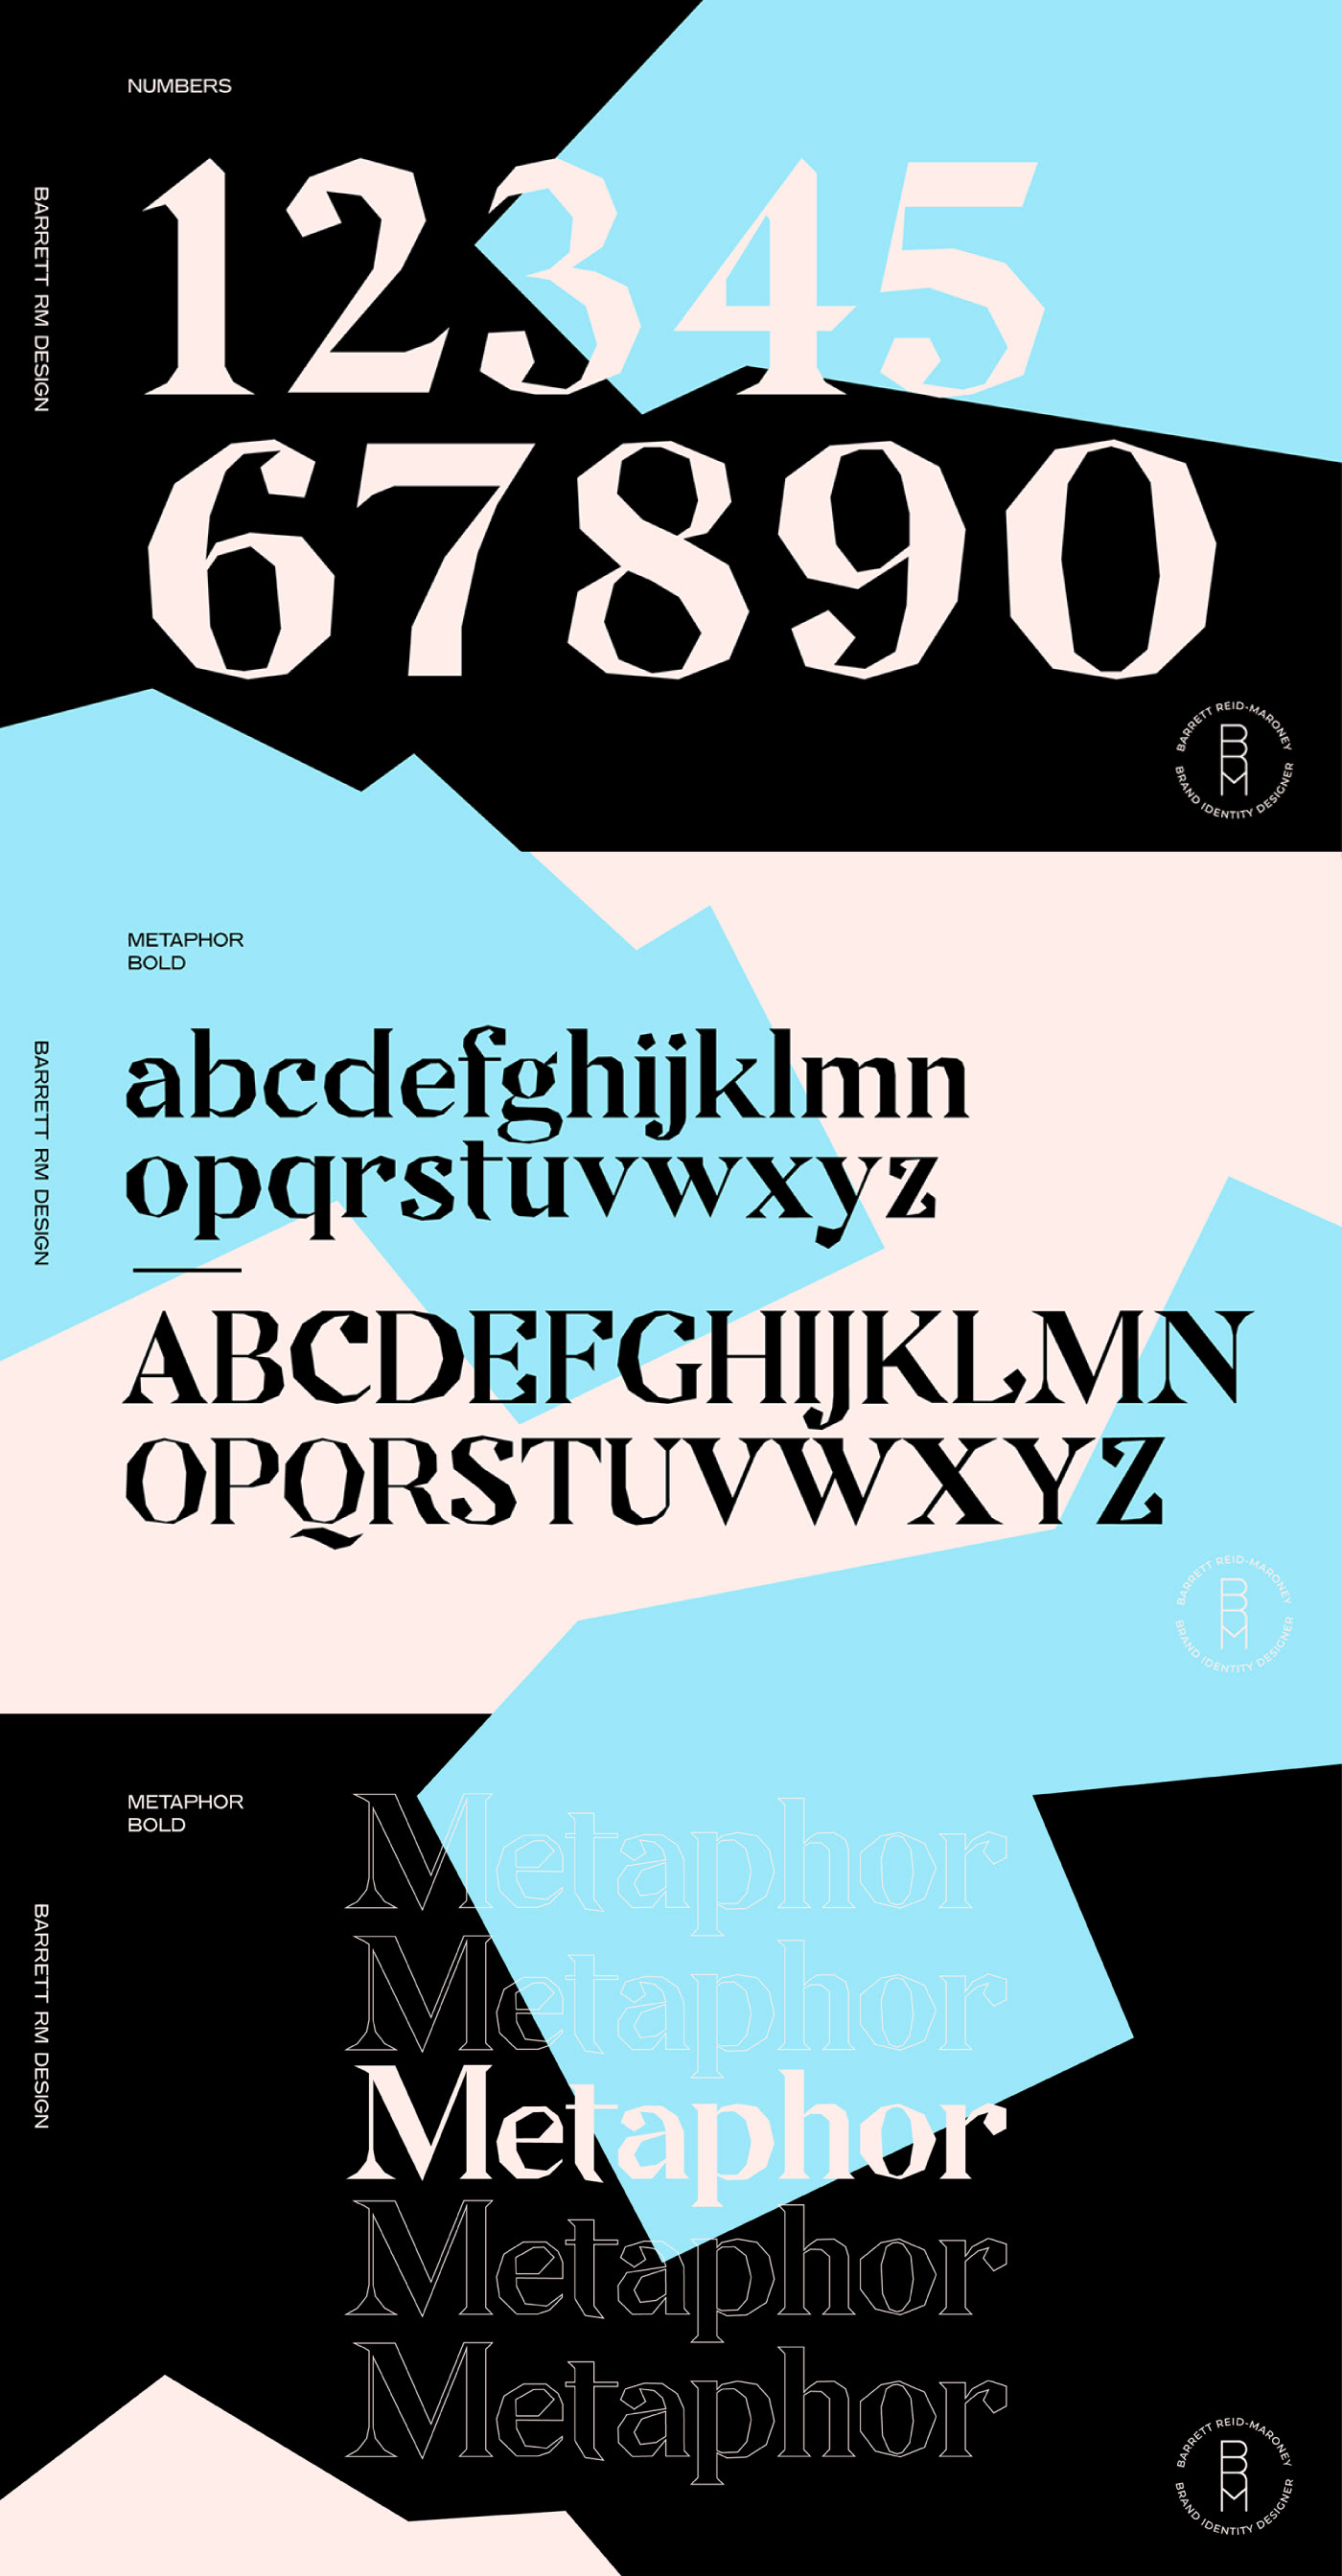 METAPHOR Free Font - serif